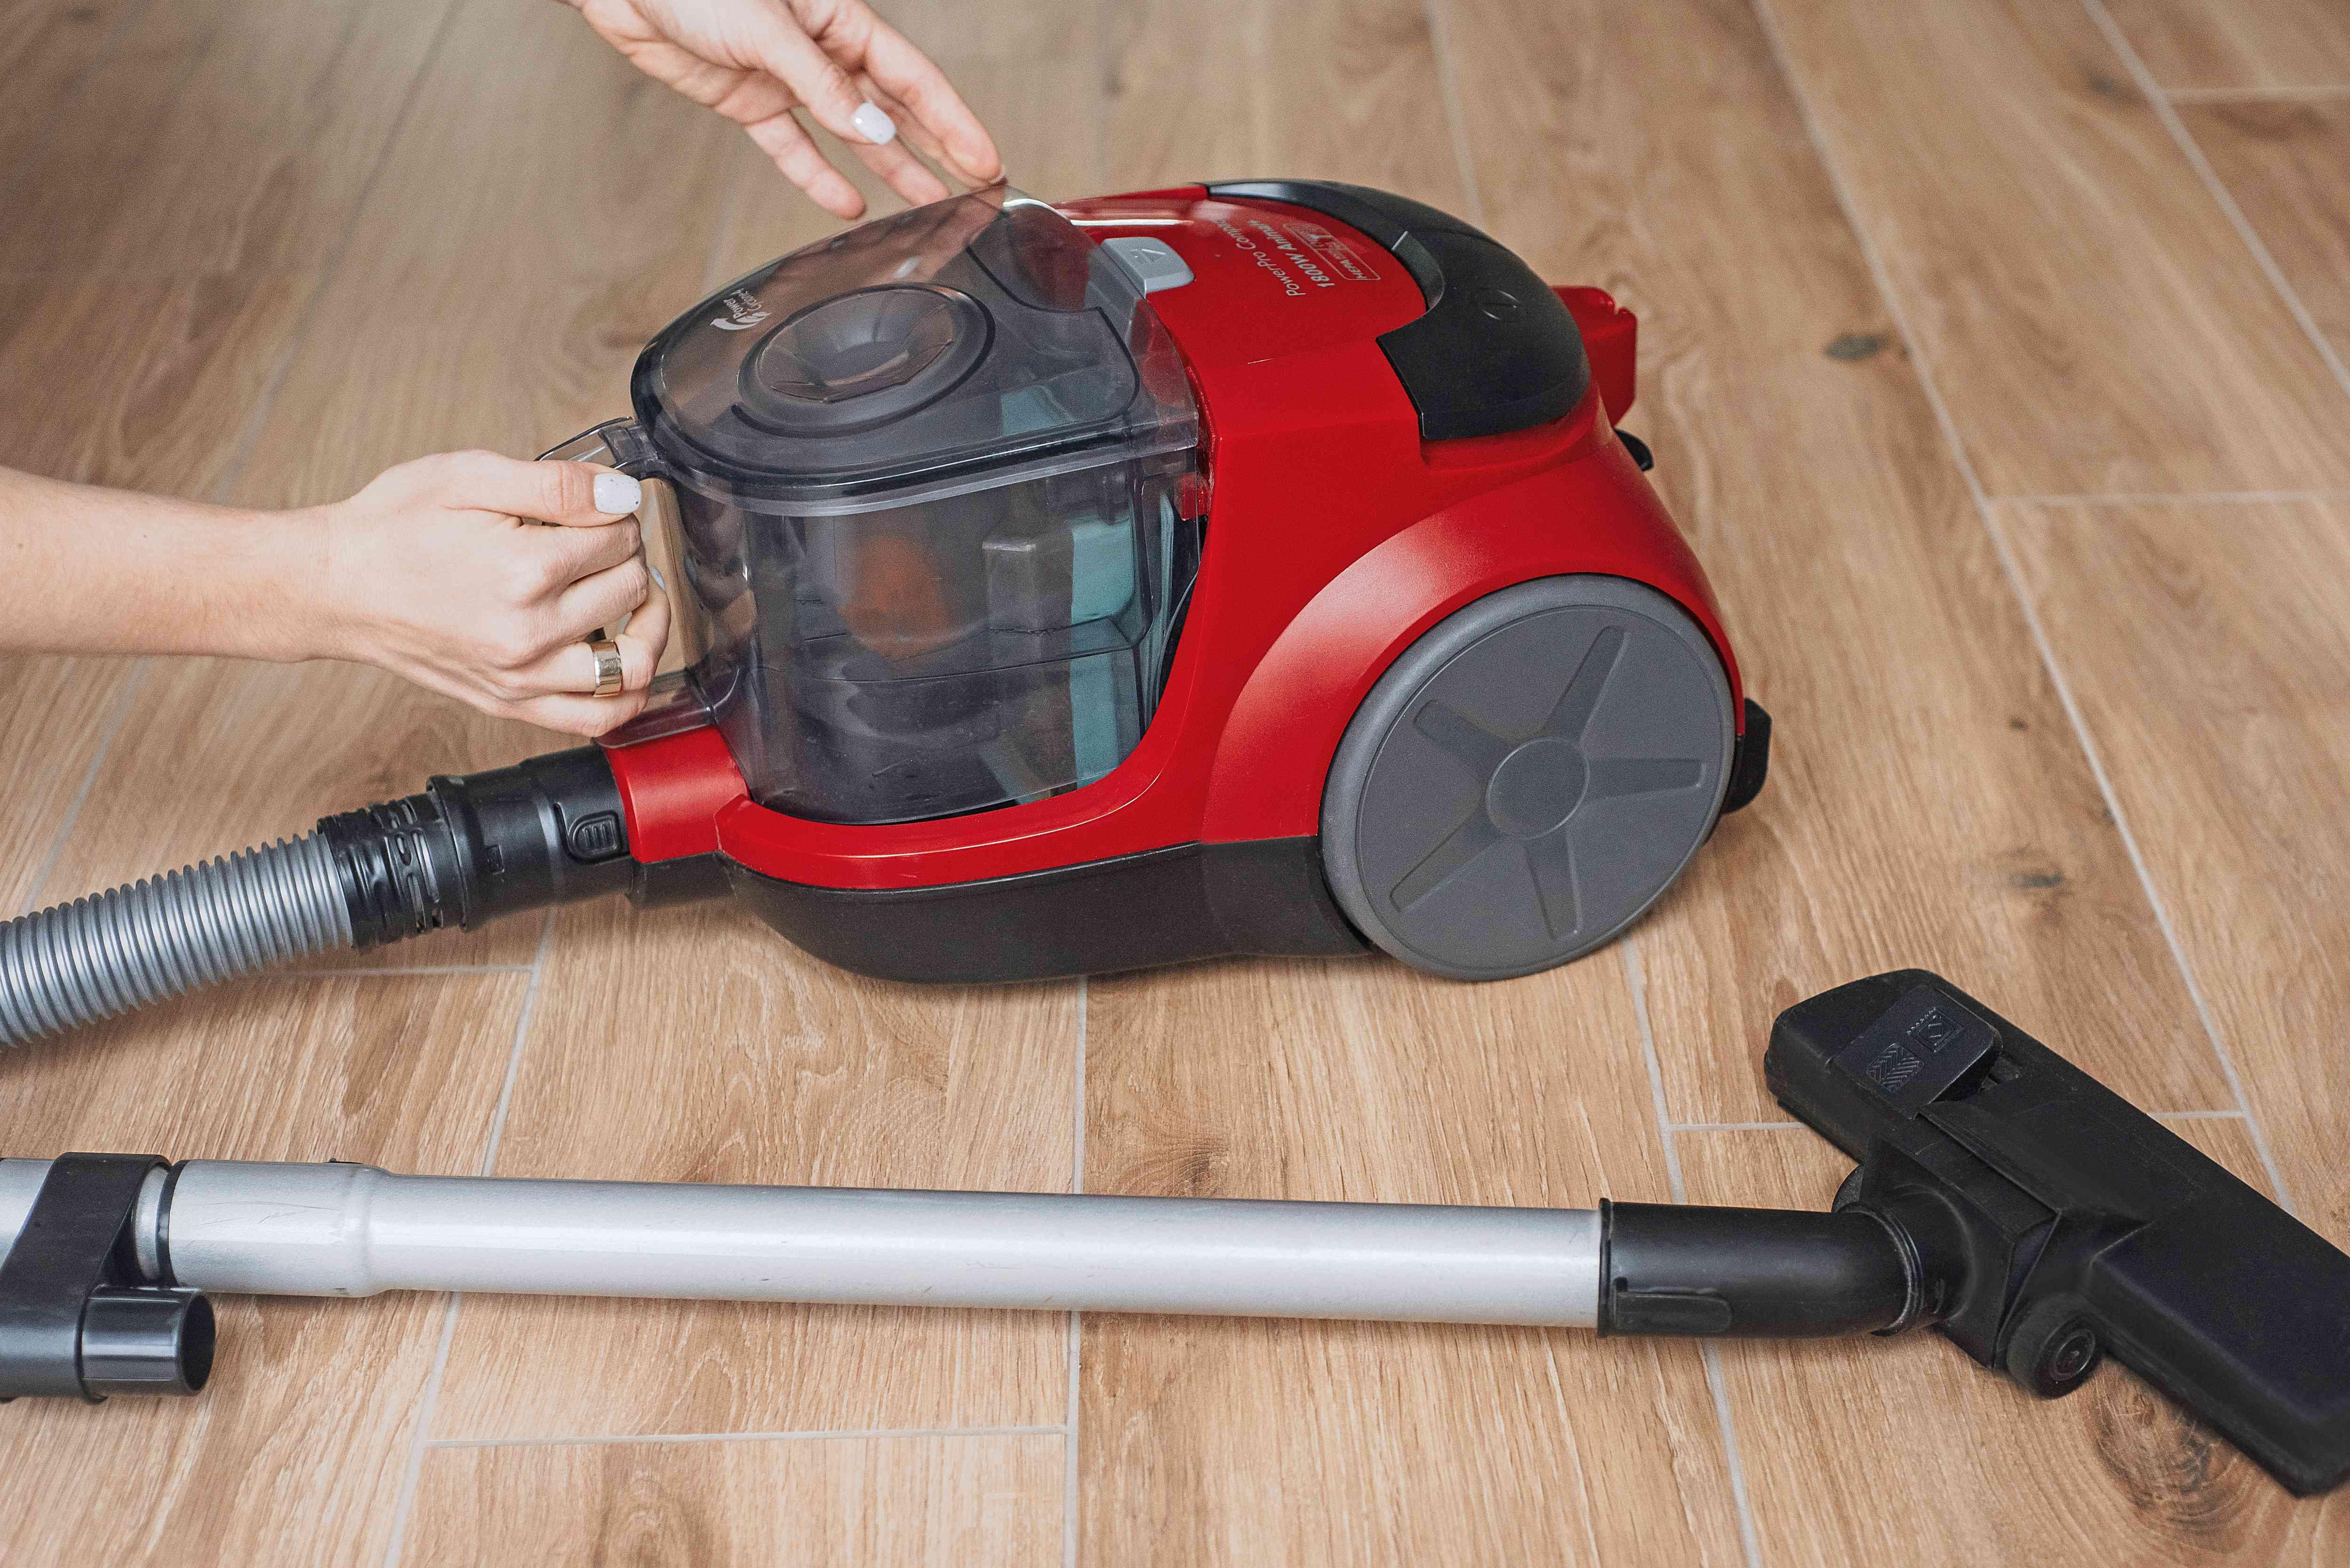 reassembling the vacuum